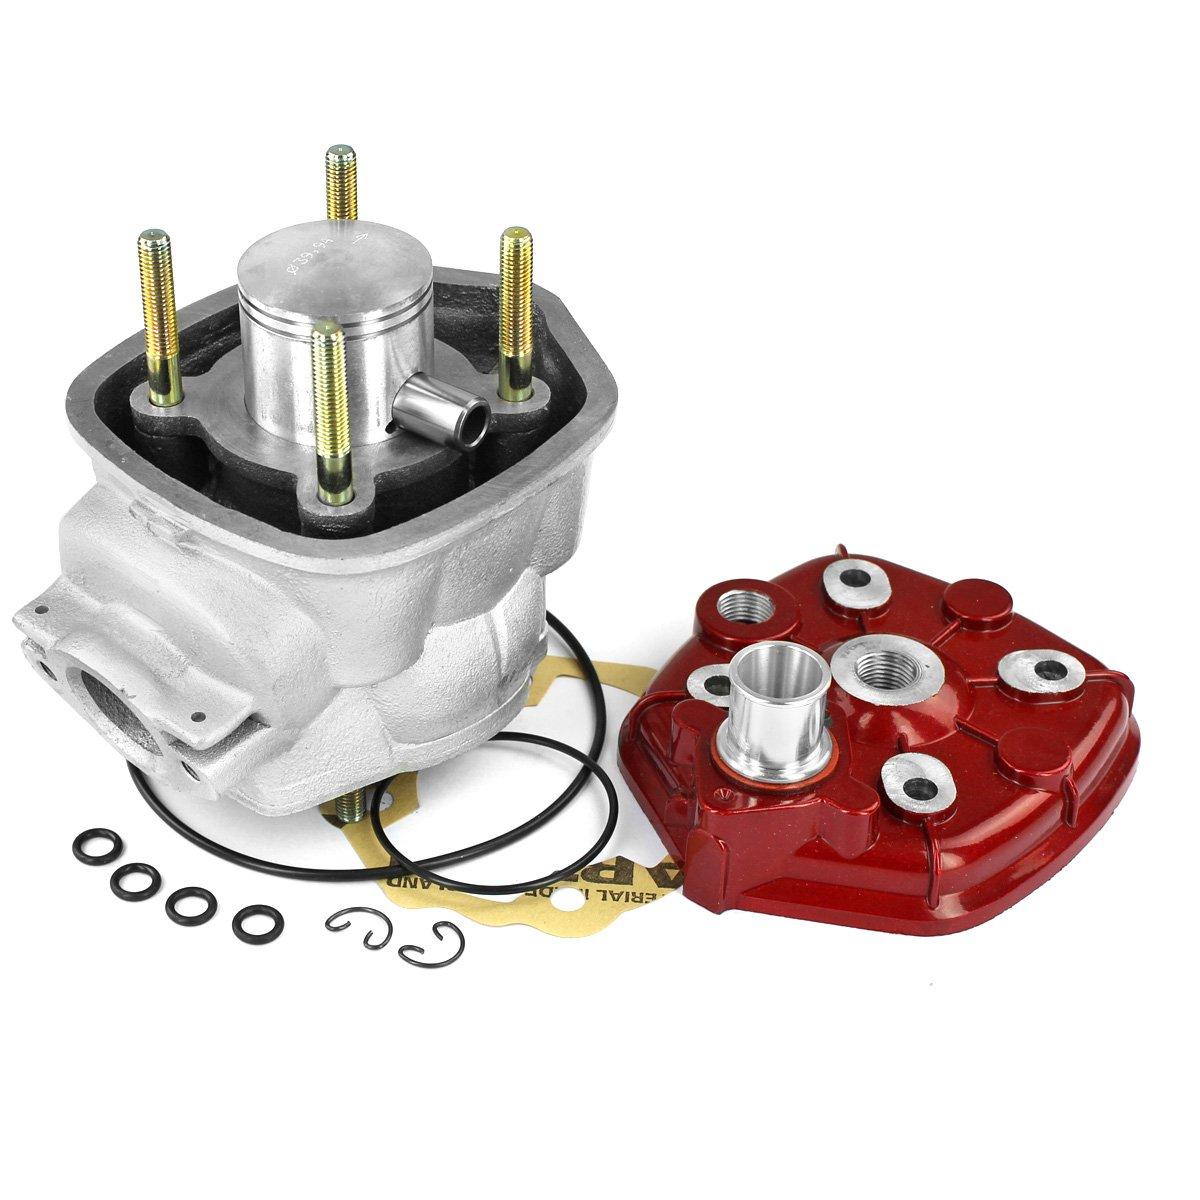 MVT 033008 Haut Moteur Iron Max Fonte Adaptateur Derbi Euro 3